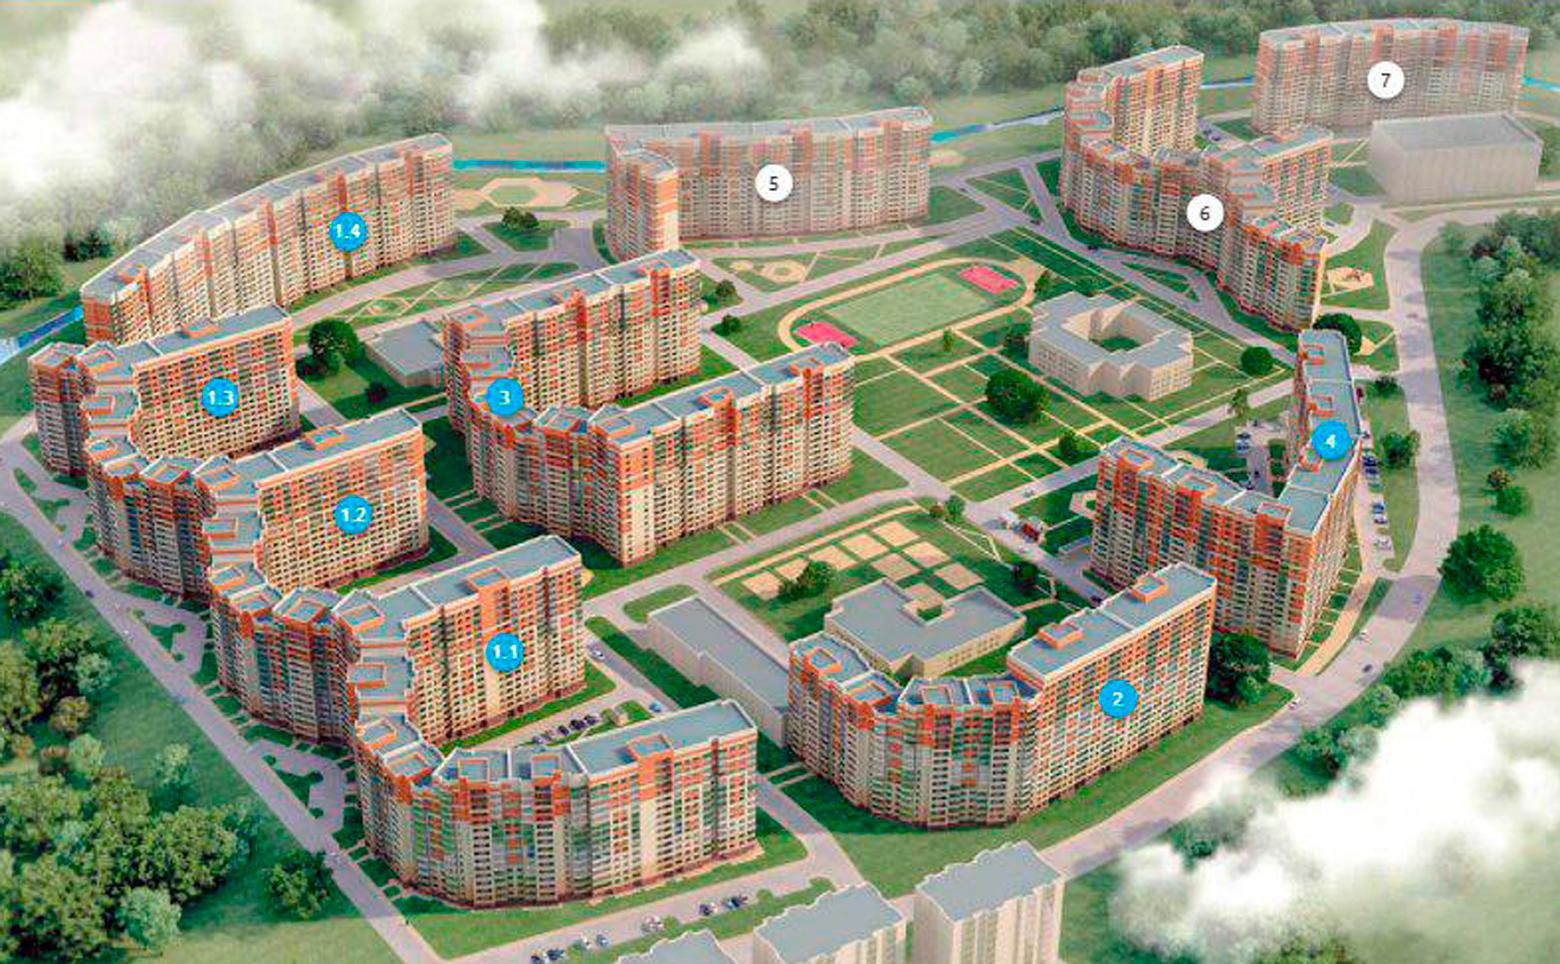 План жилого комплекса ЖК Муринский посад